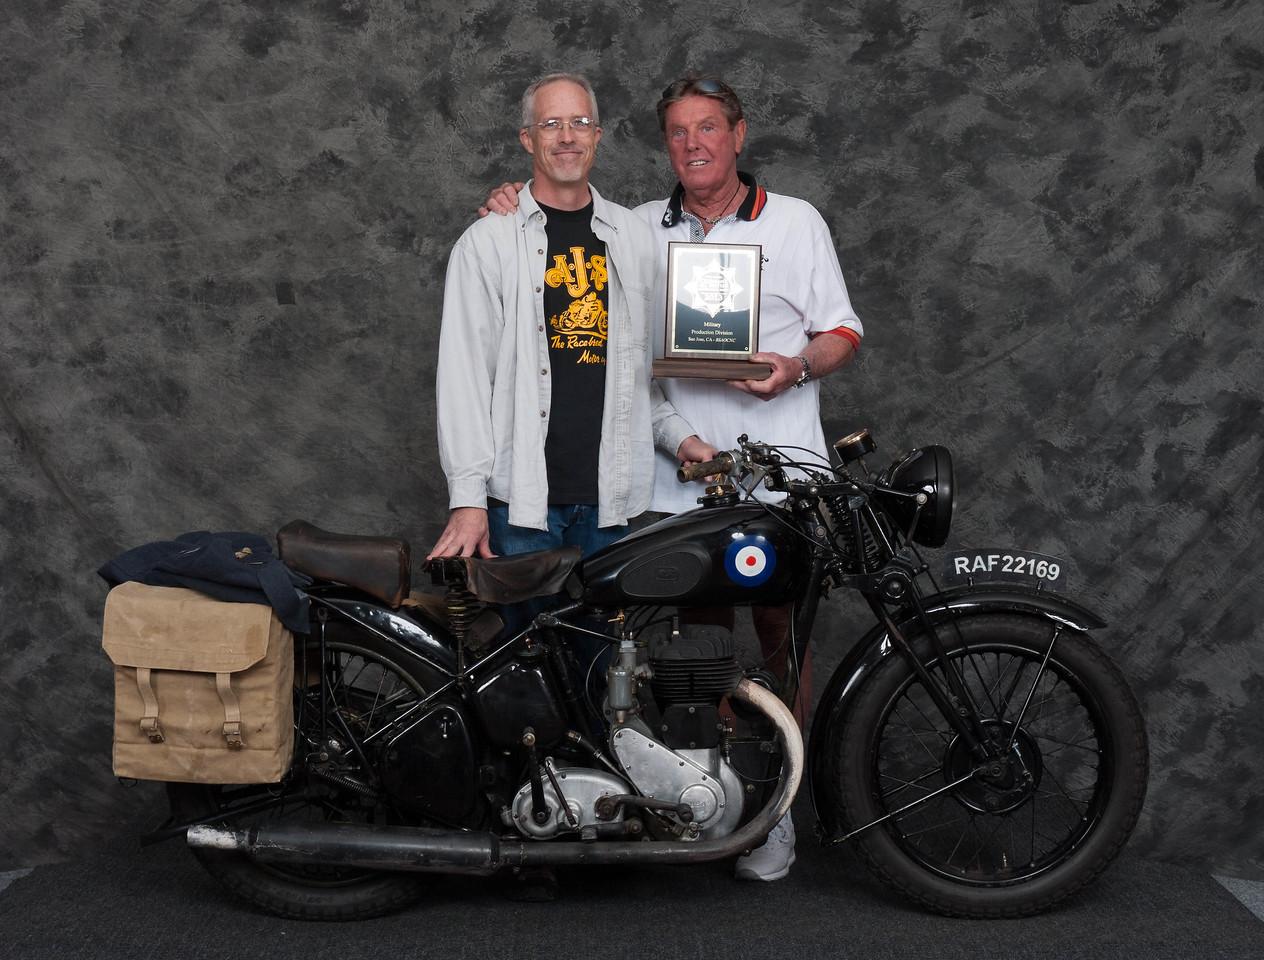 Mark Frost, Winner of Military 1900-1983, Production Class - 1942 BSA WM20